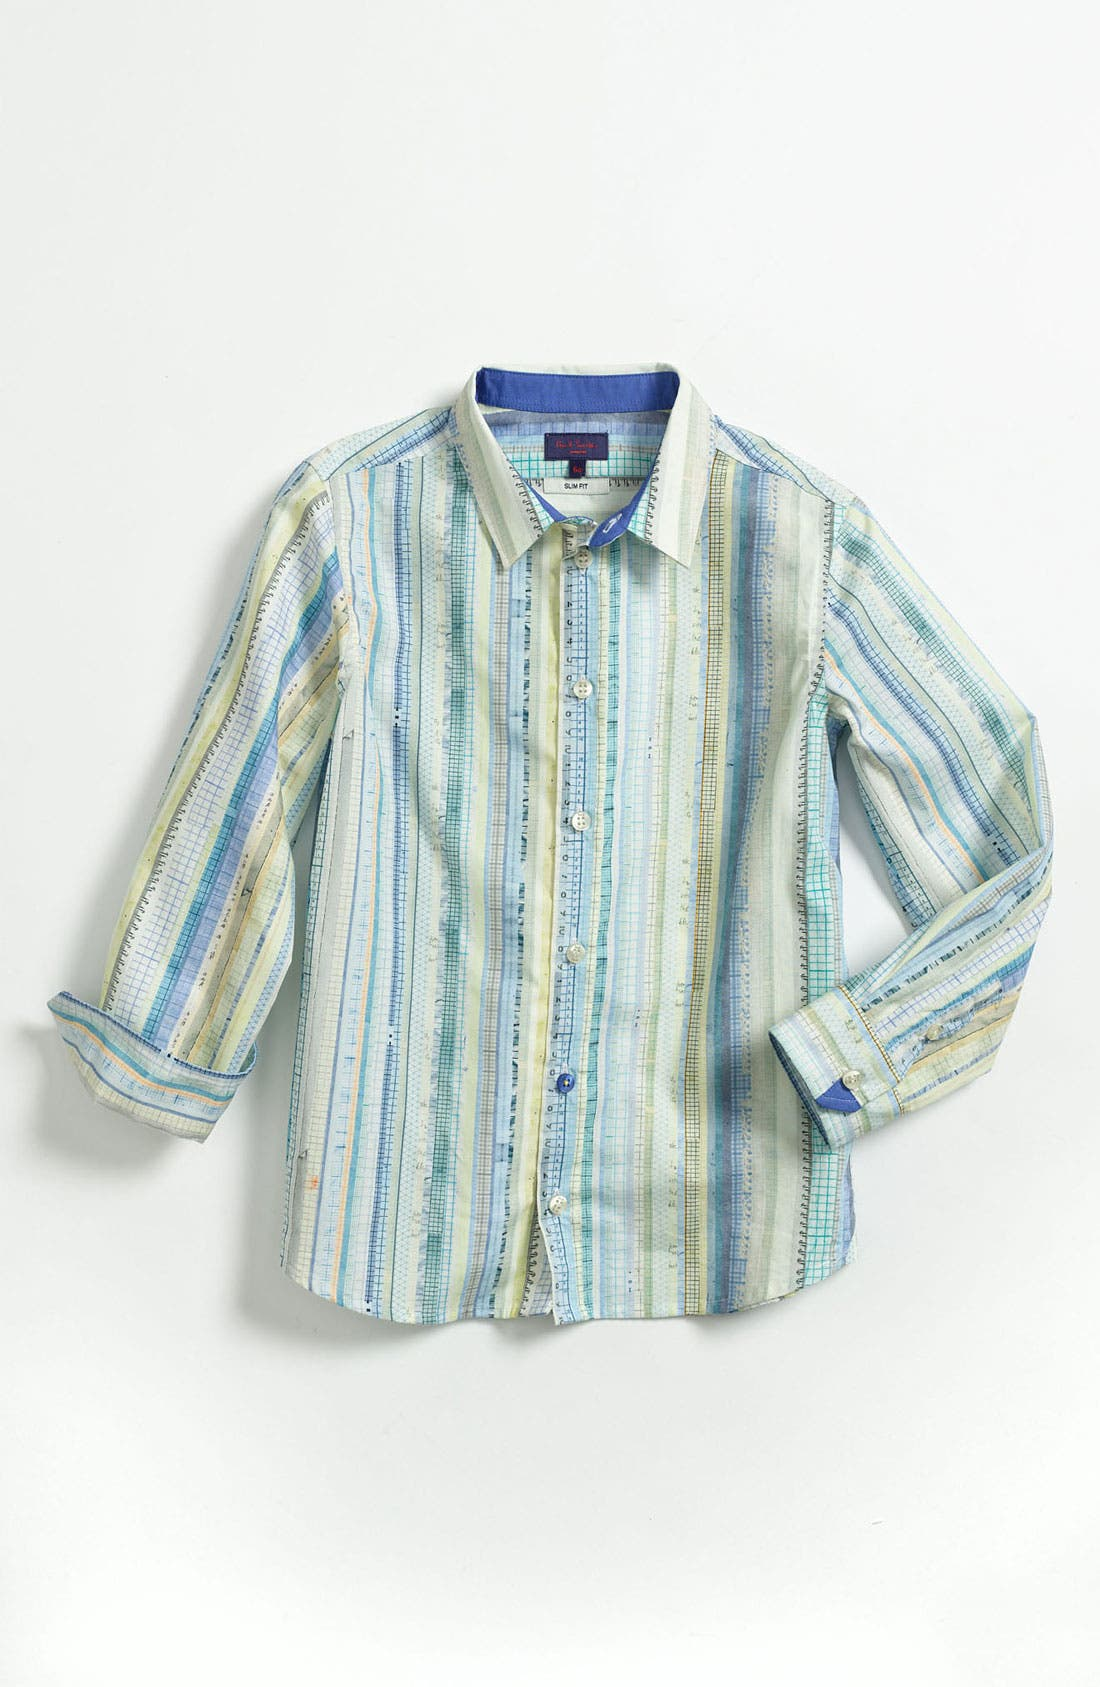 Main Image - Paul Smith Junior Dress Shirt (Little Boys & Big Boys)